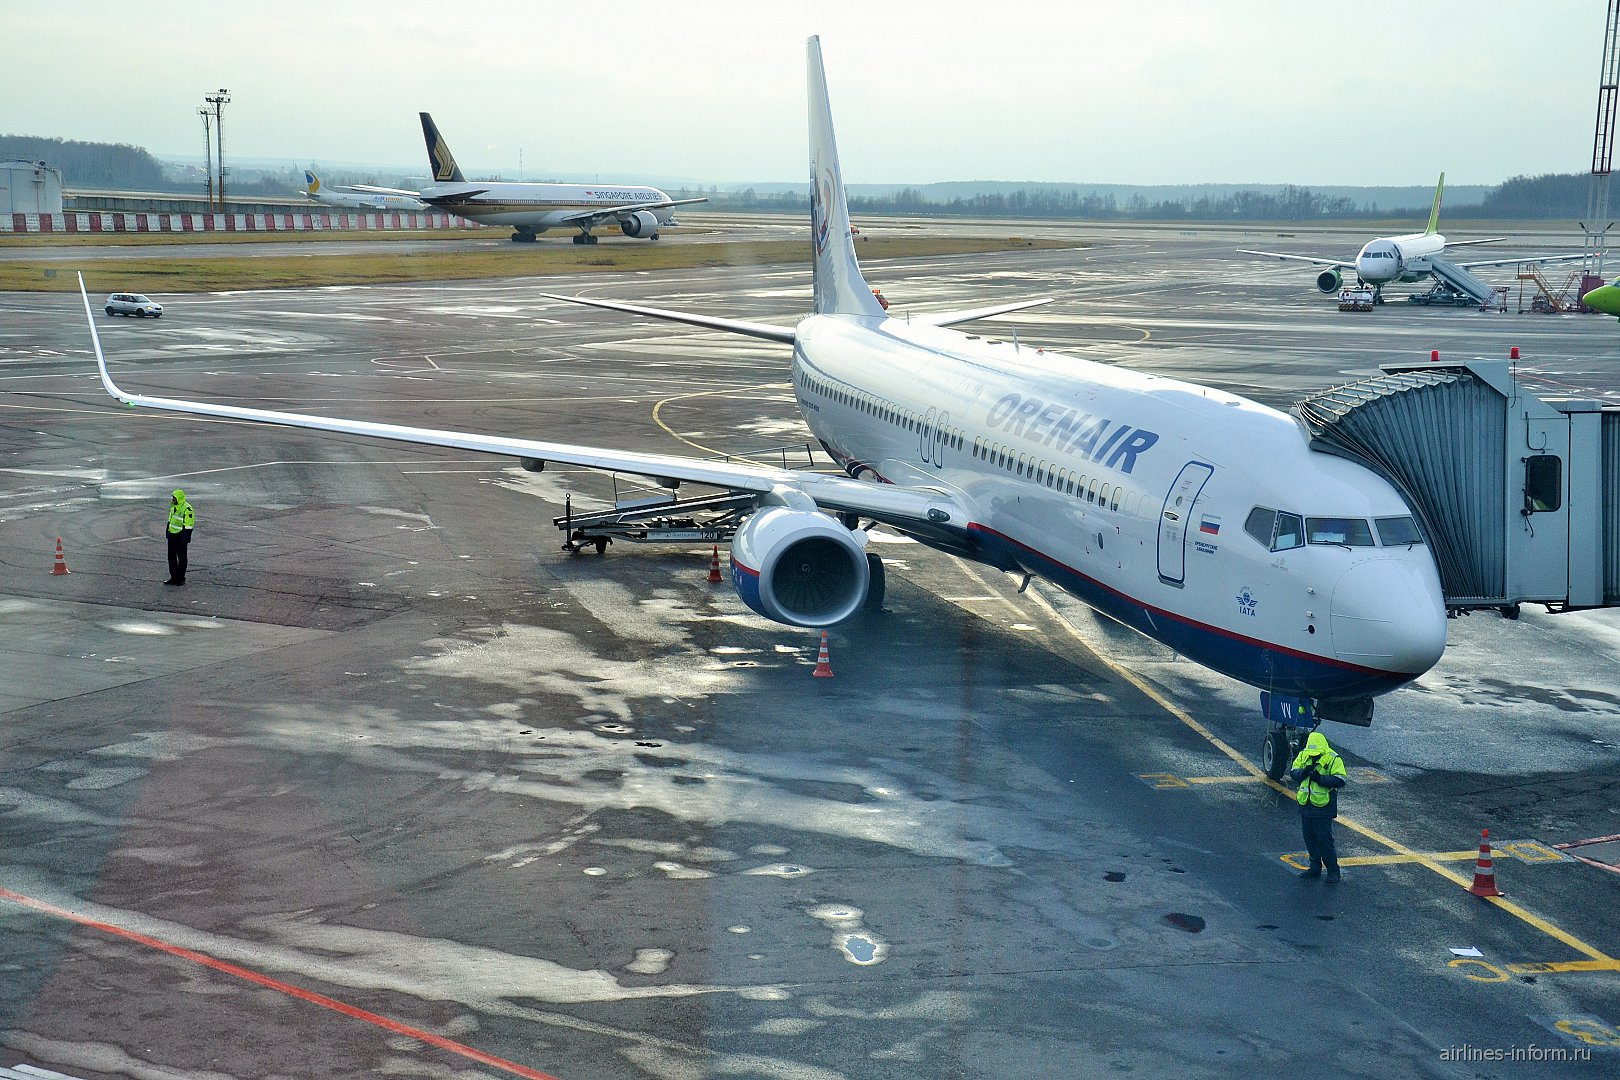 Боинг 737-800 Оренбургских Авиалиний в аэропорту Домодедово